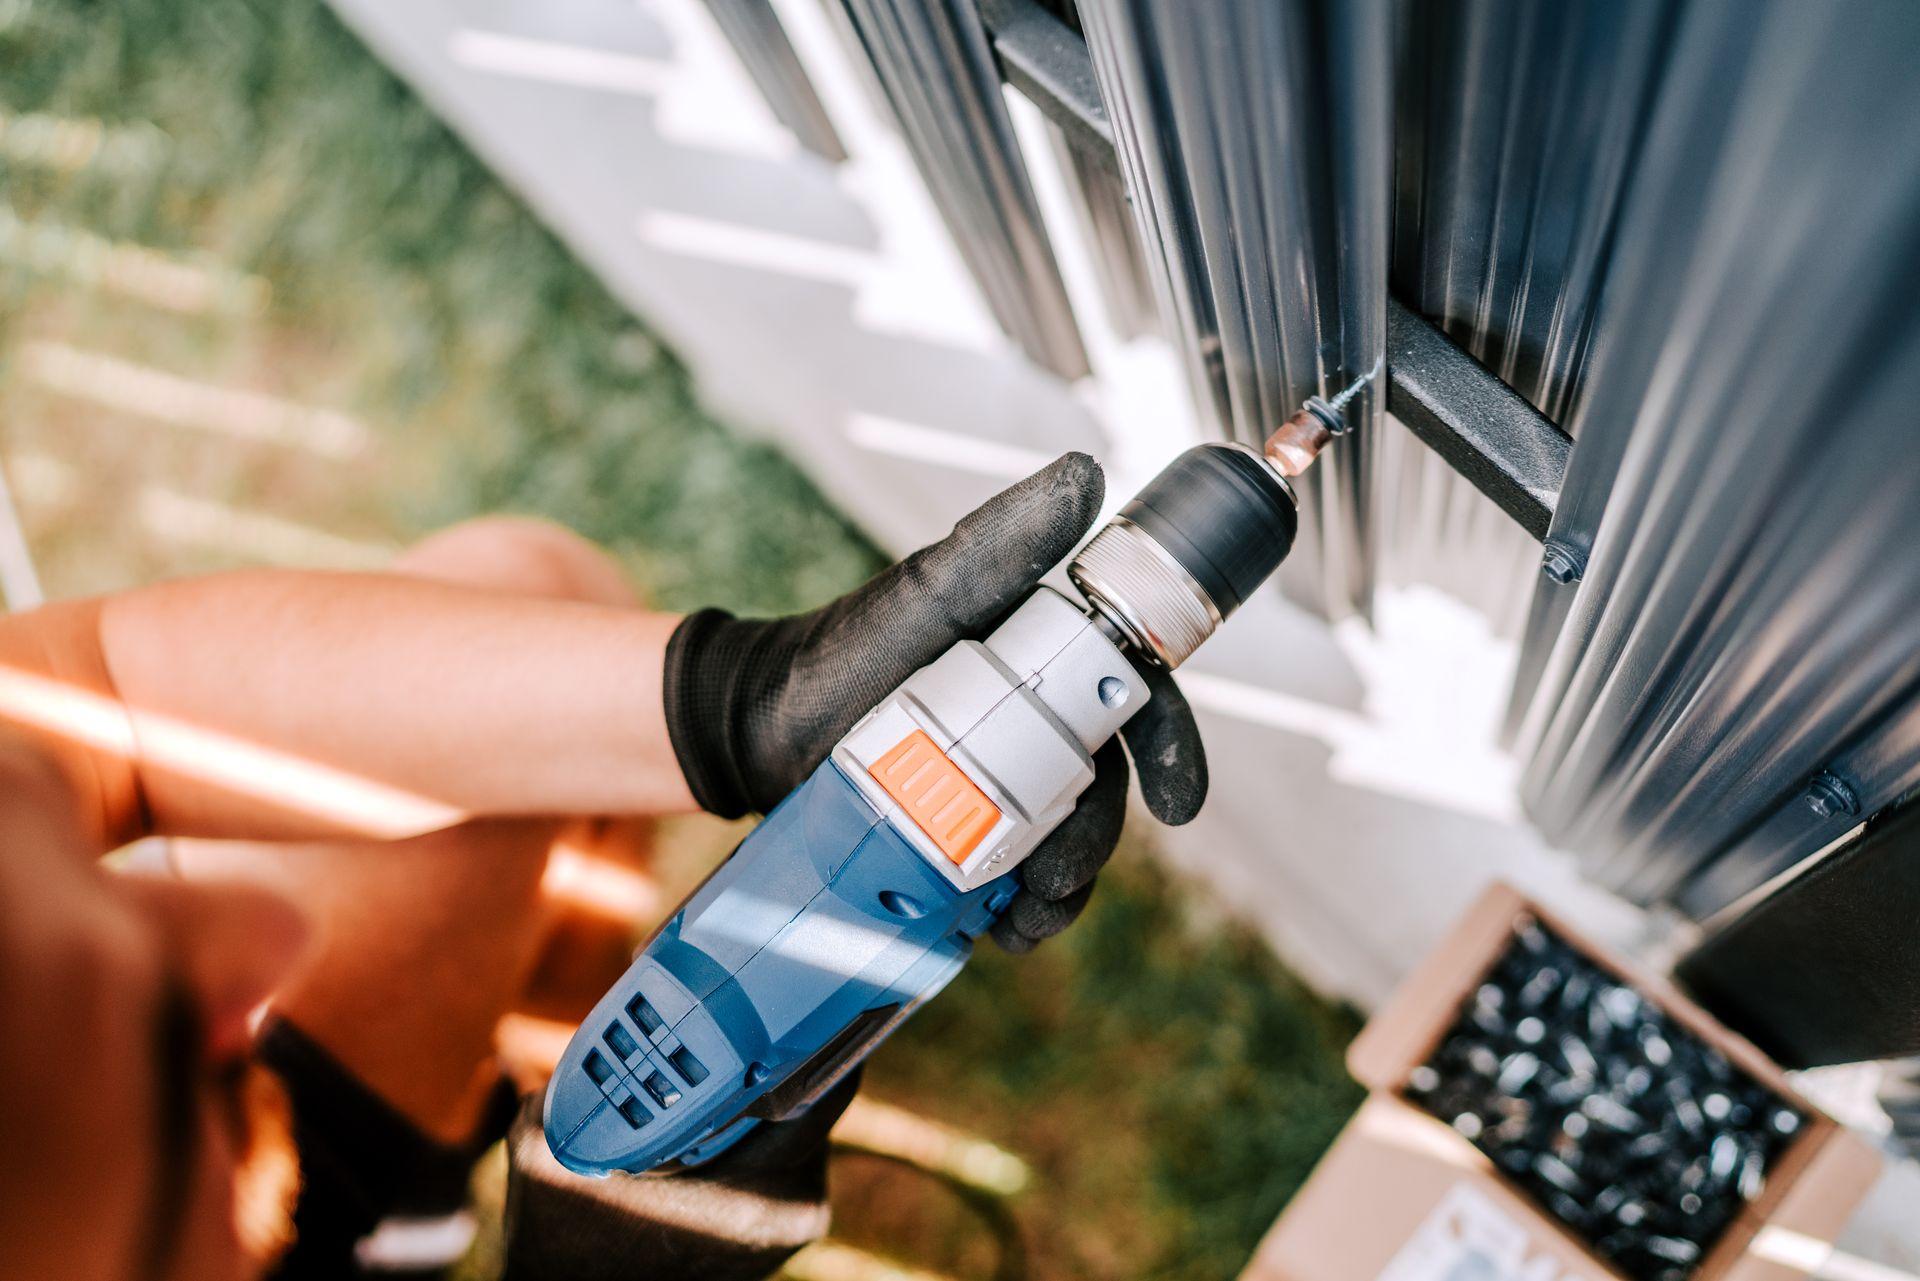 construction-worker-working-with-an-electric-screw-CBJTVNJ.jpg